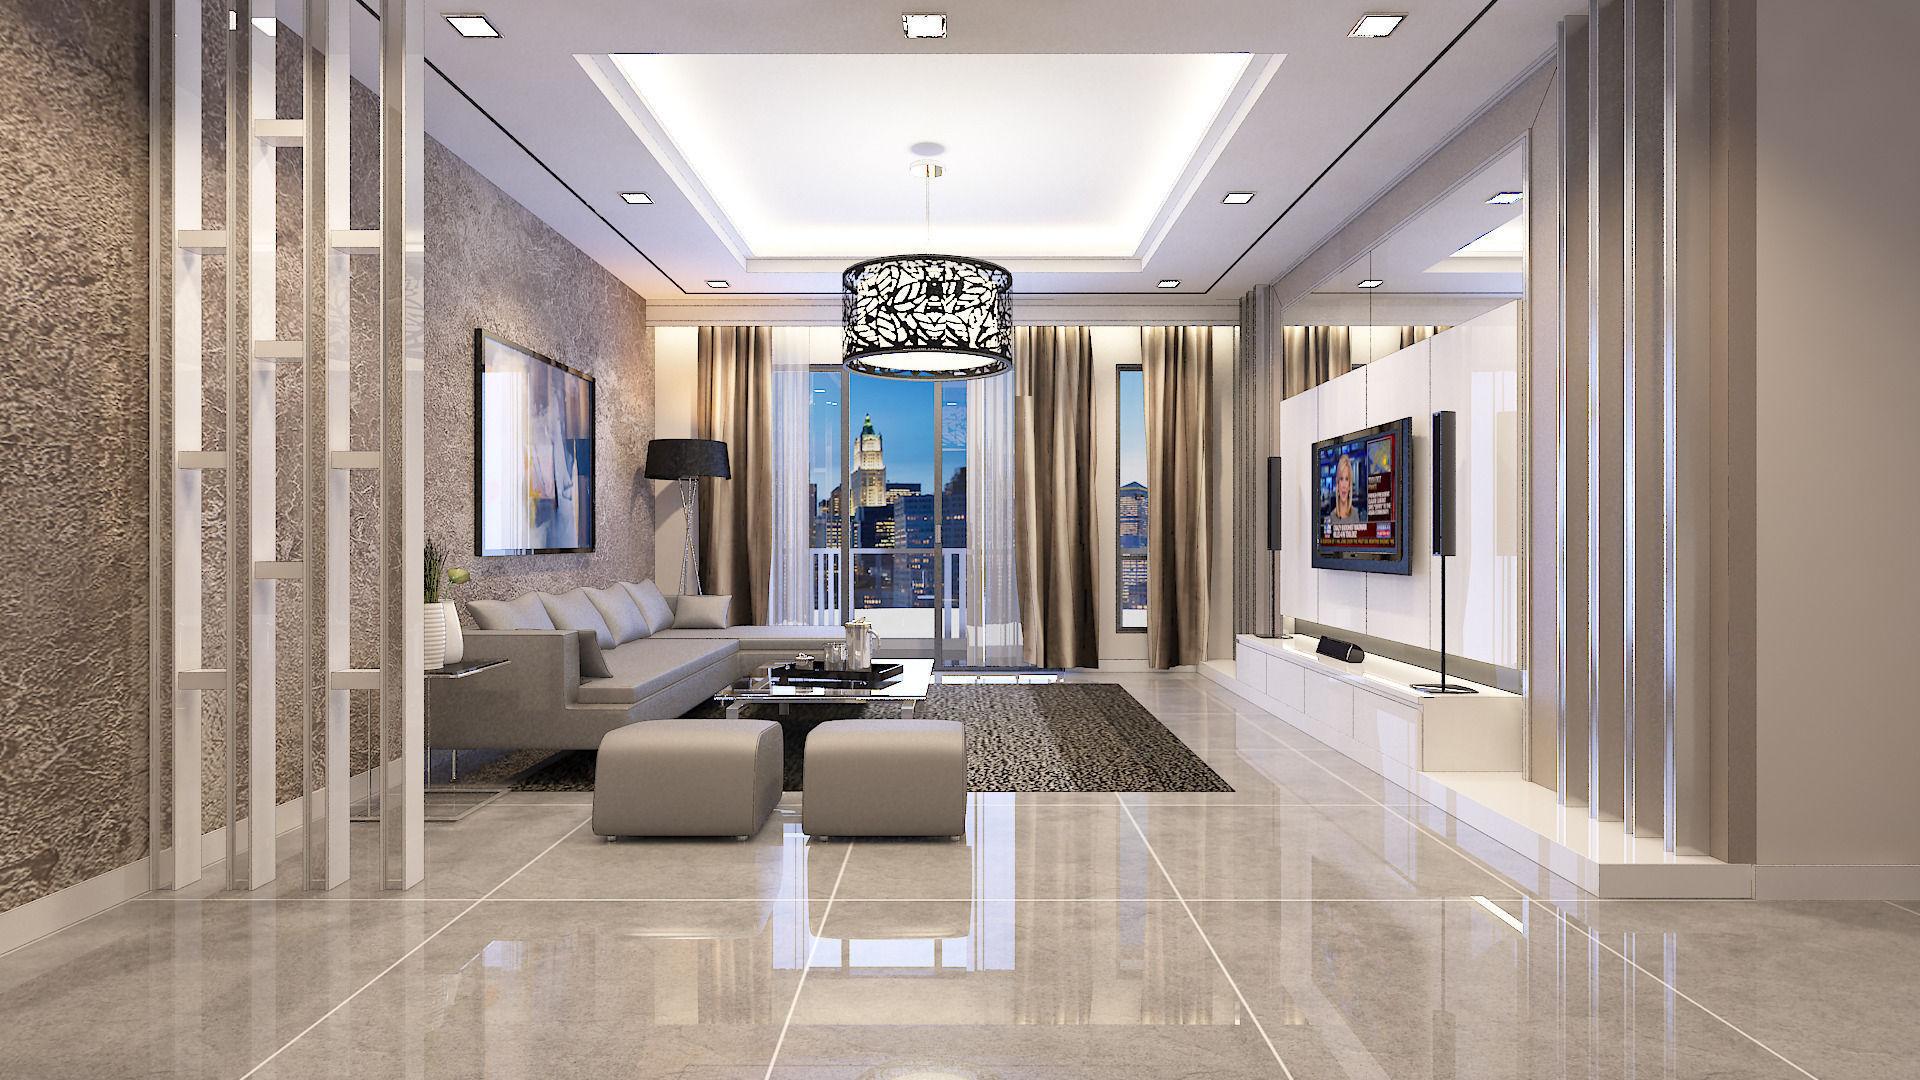 living room design 3d model  Living Room Condominium 3D model | CGTrader